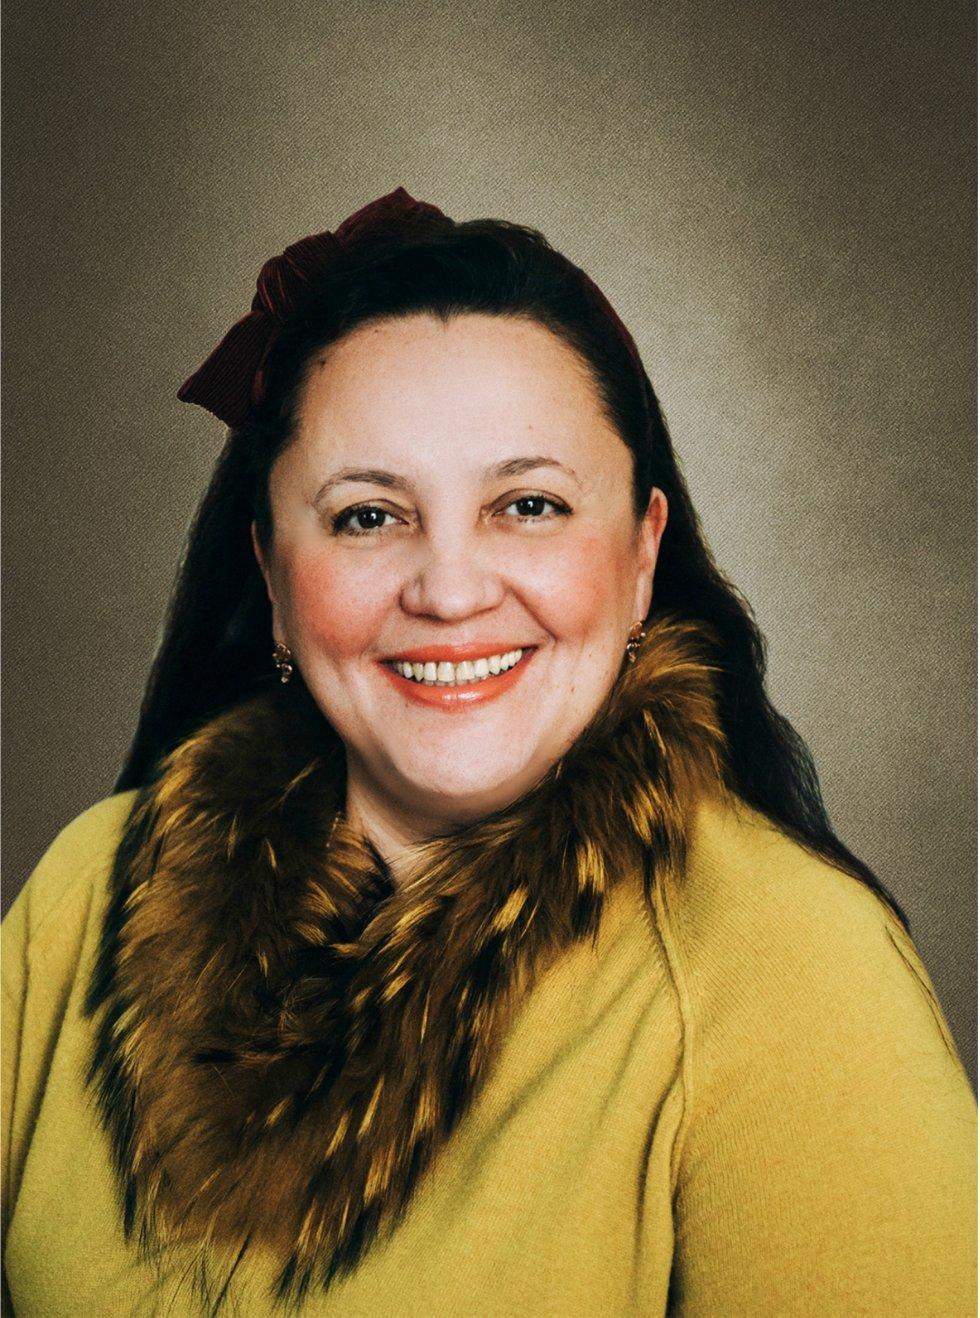 Сабирова Диана Рустамовна